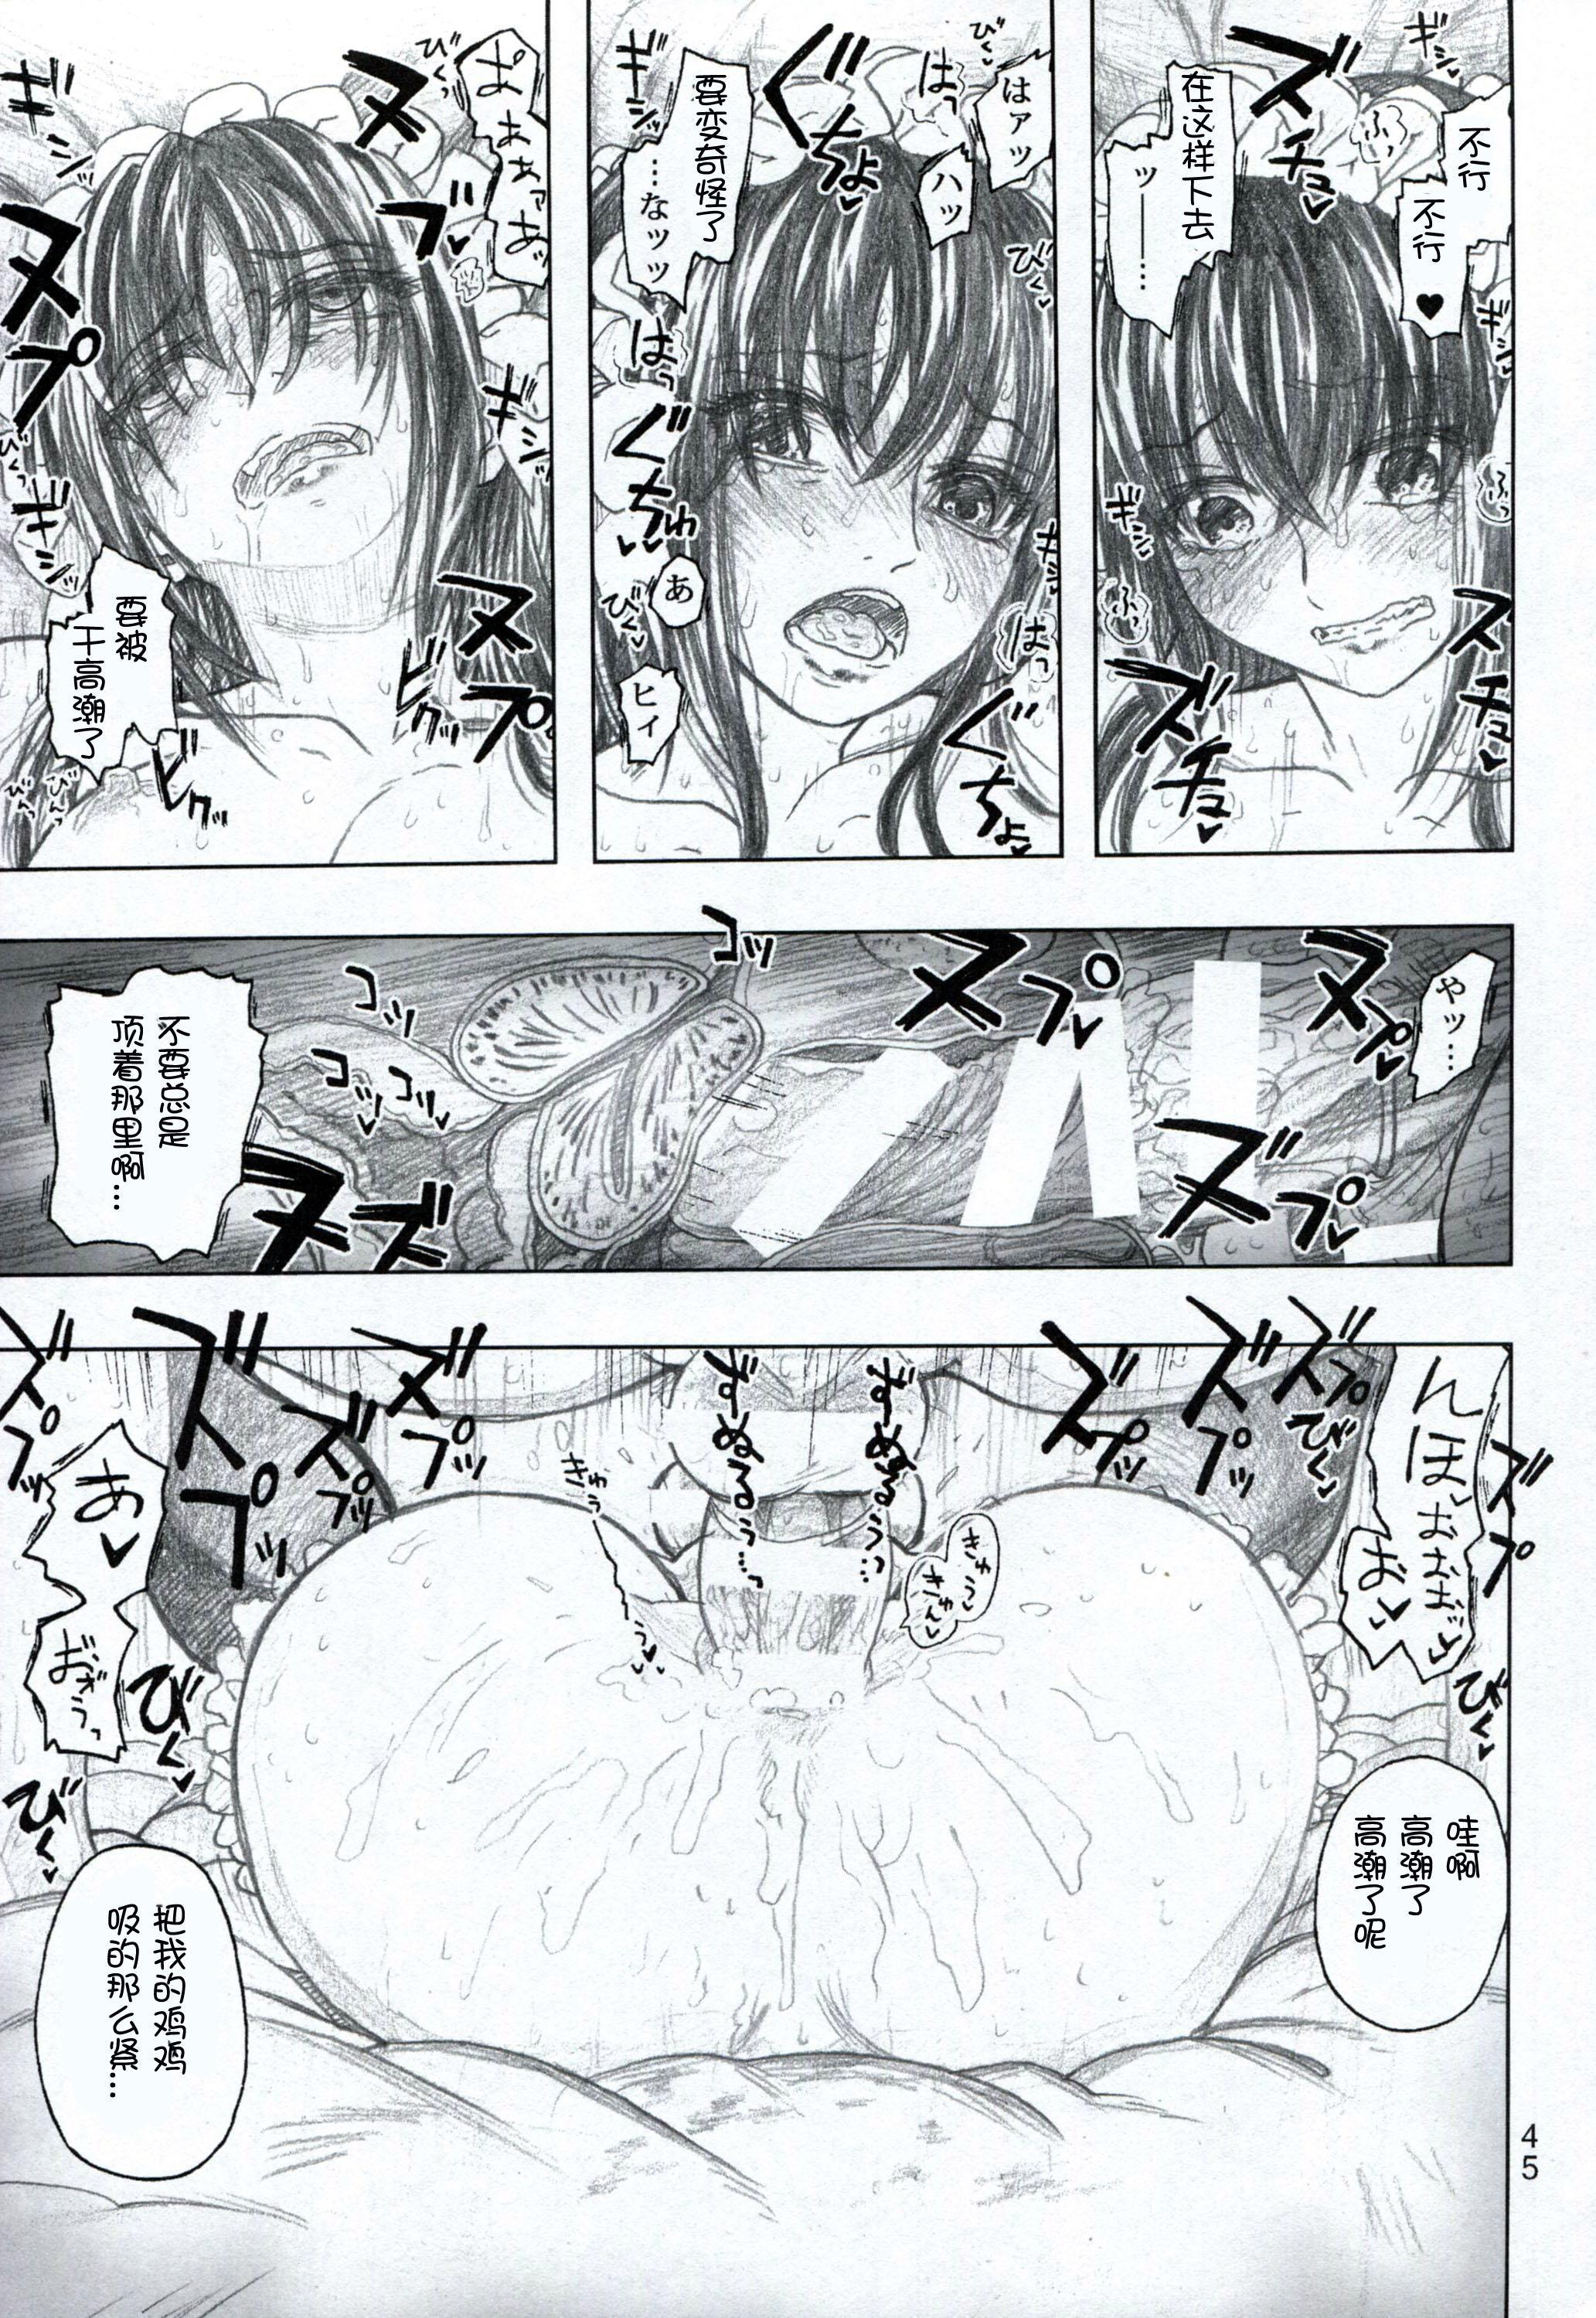 Moyashimon 2 TALES OF KEI Kei Hon 45